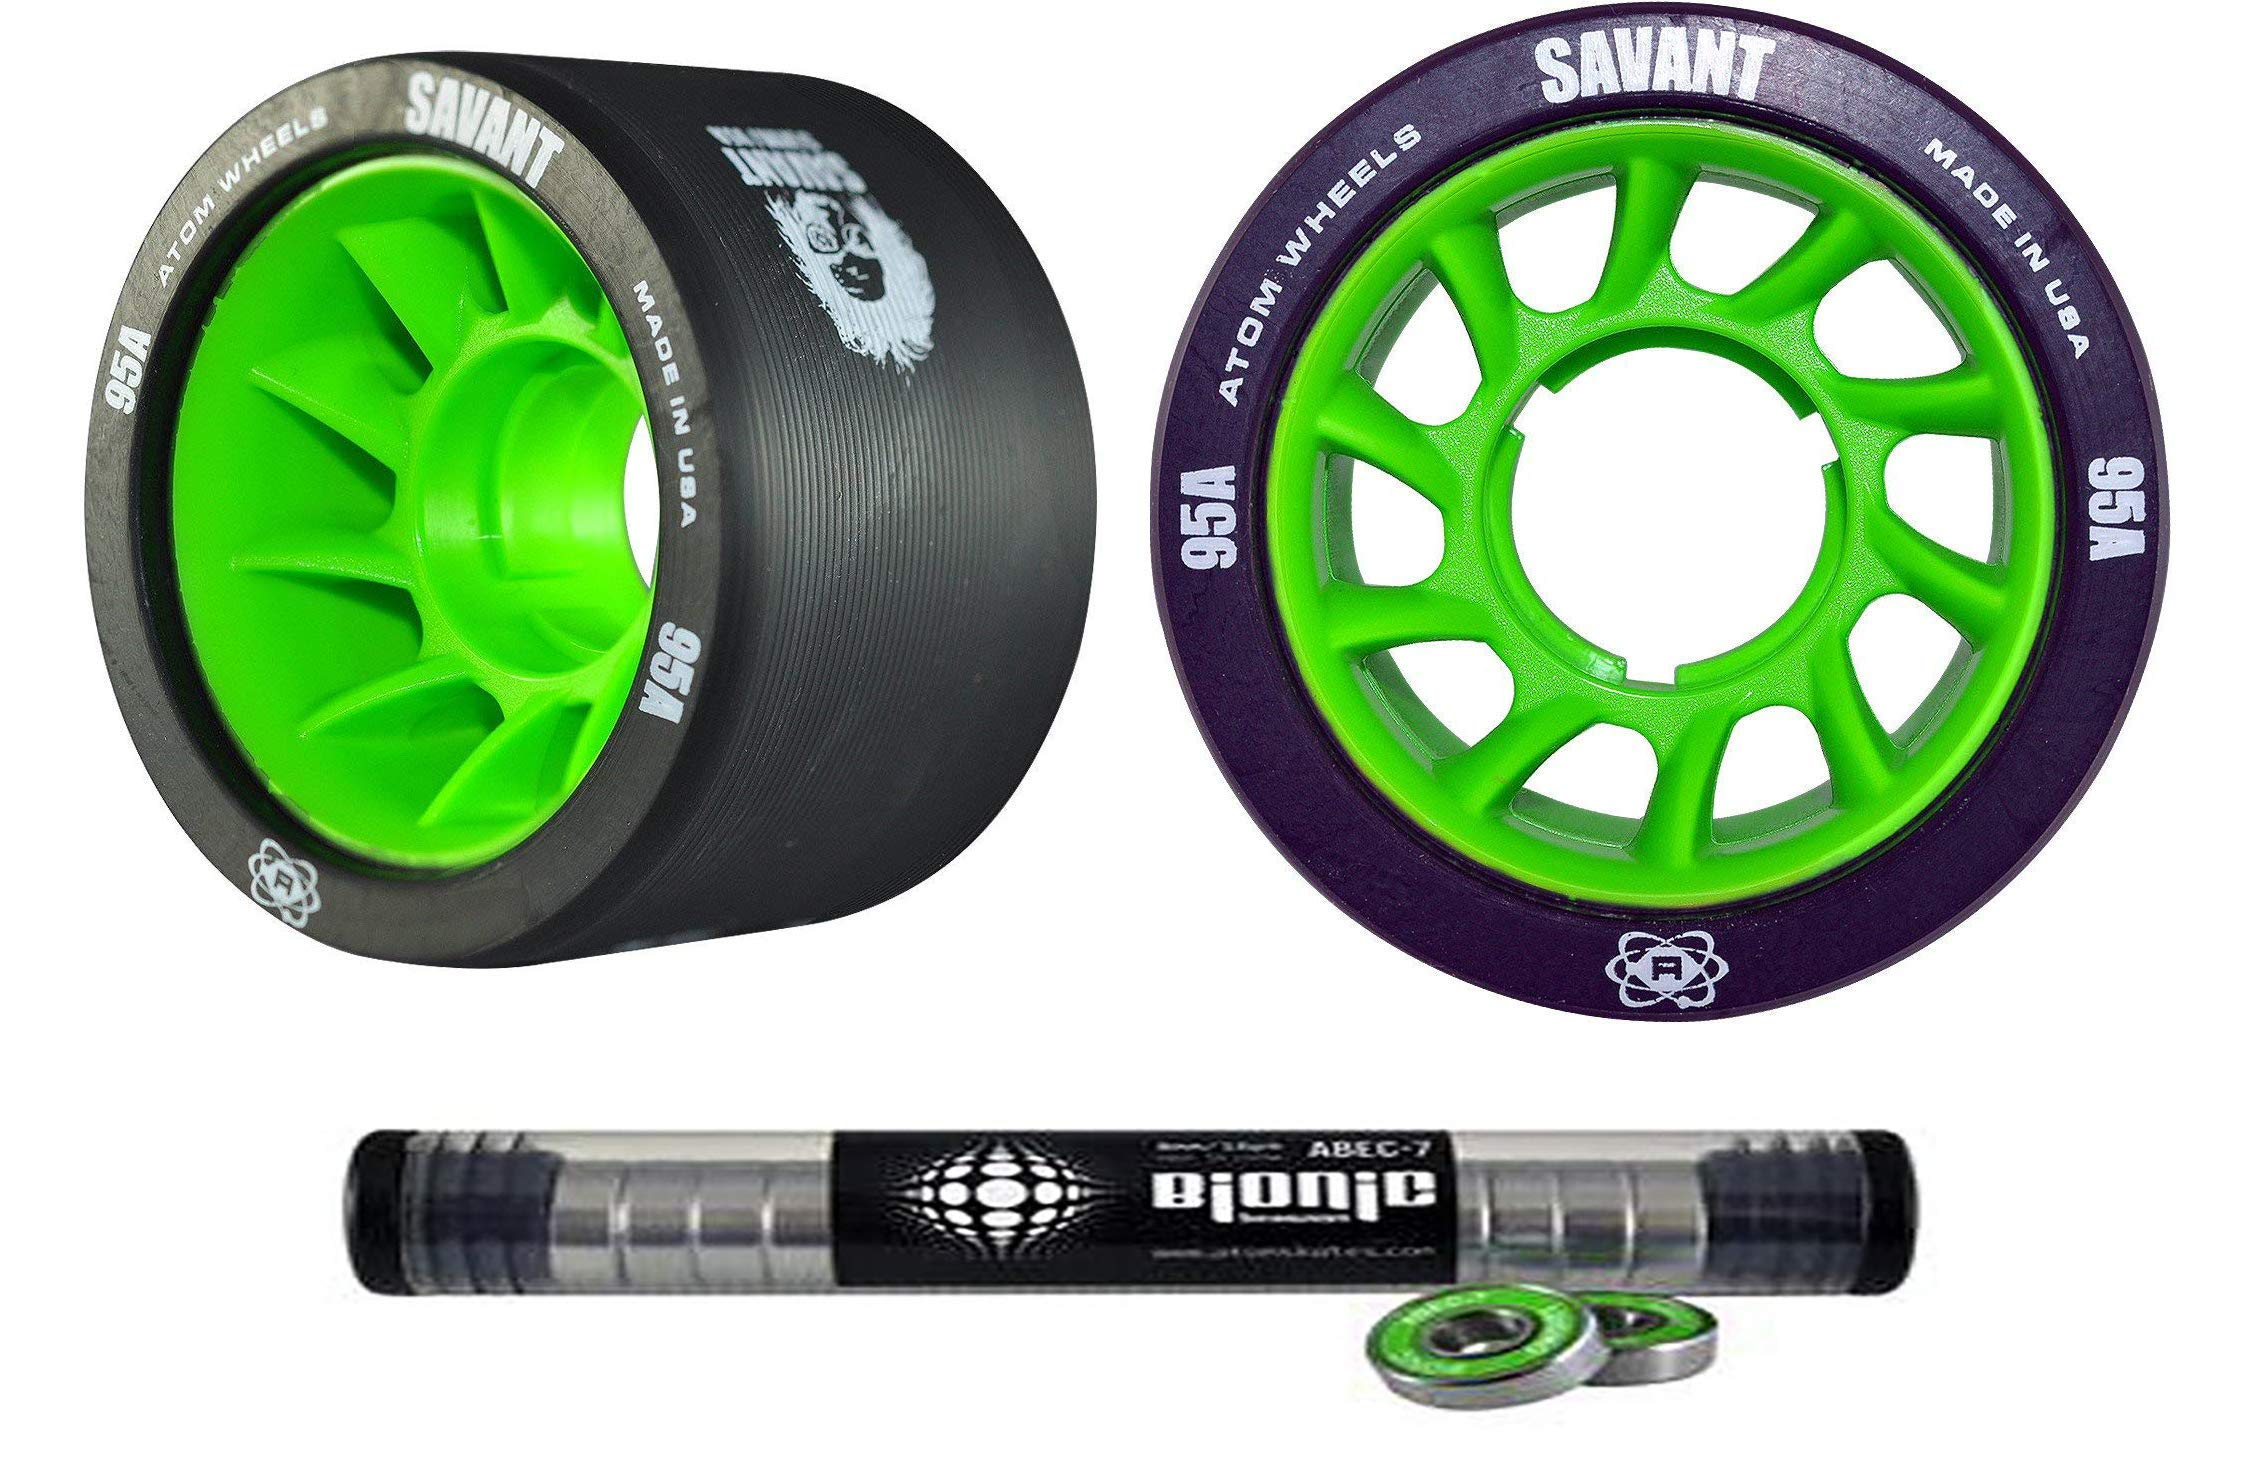 Atom Savant Skate Wheels with Bionic Bearings 8mm Full Set of 8 Black 95A by Atom Skates